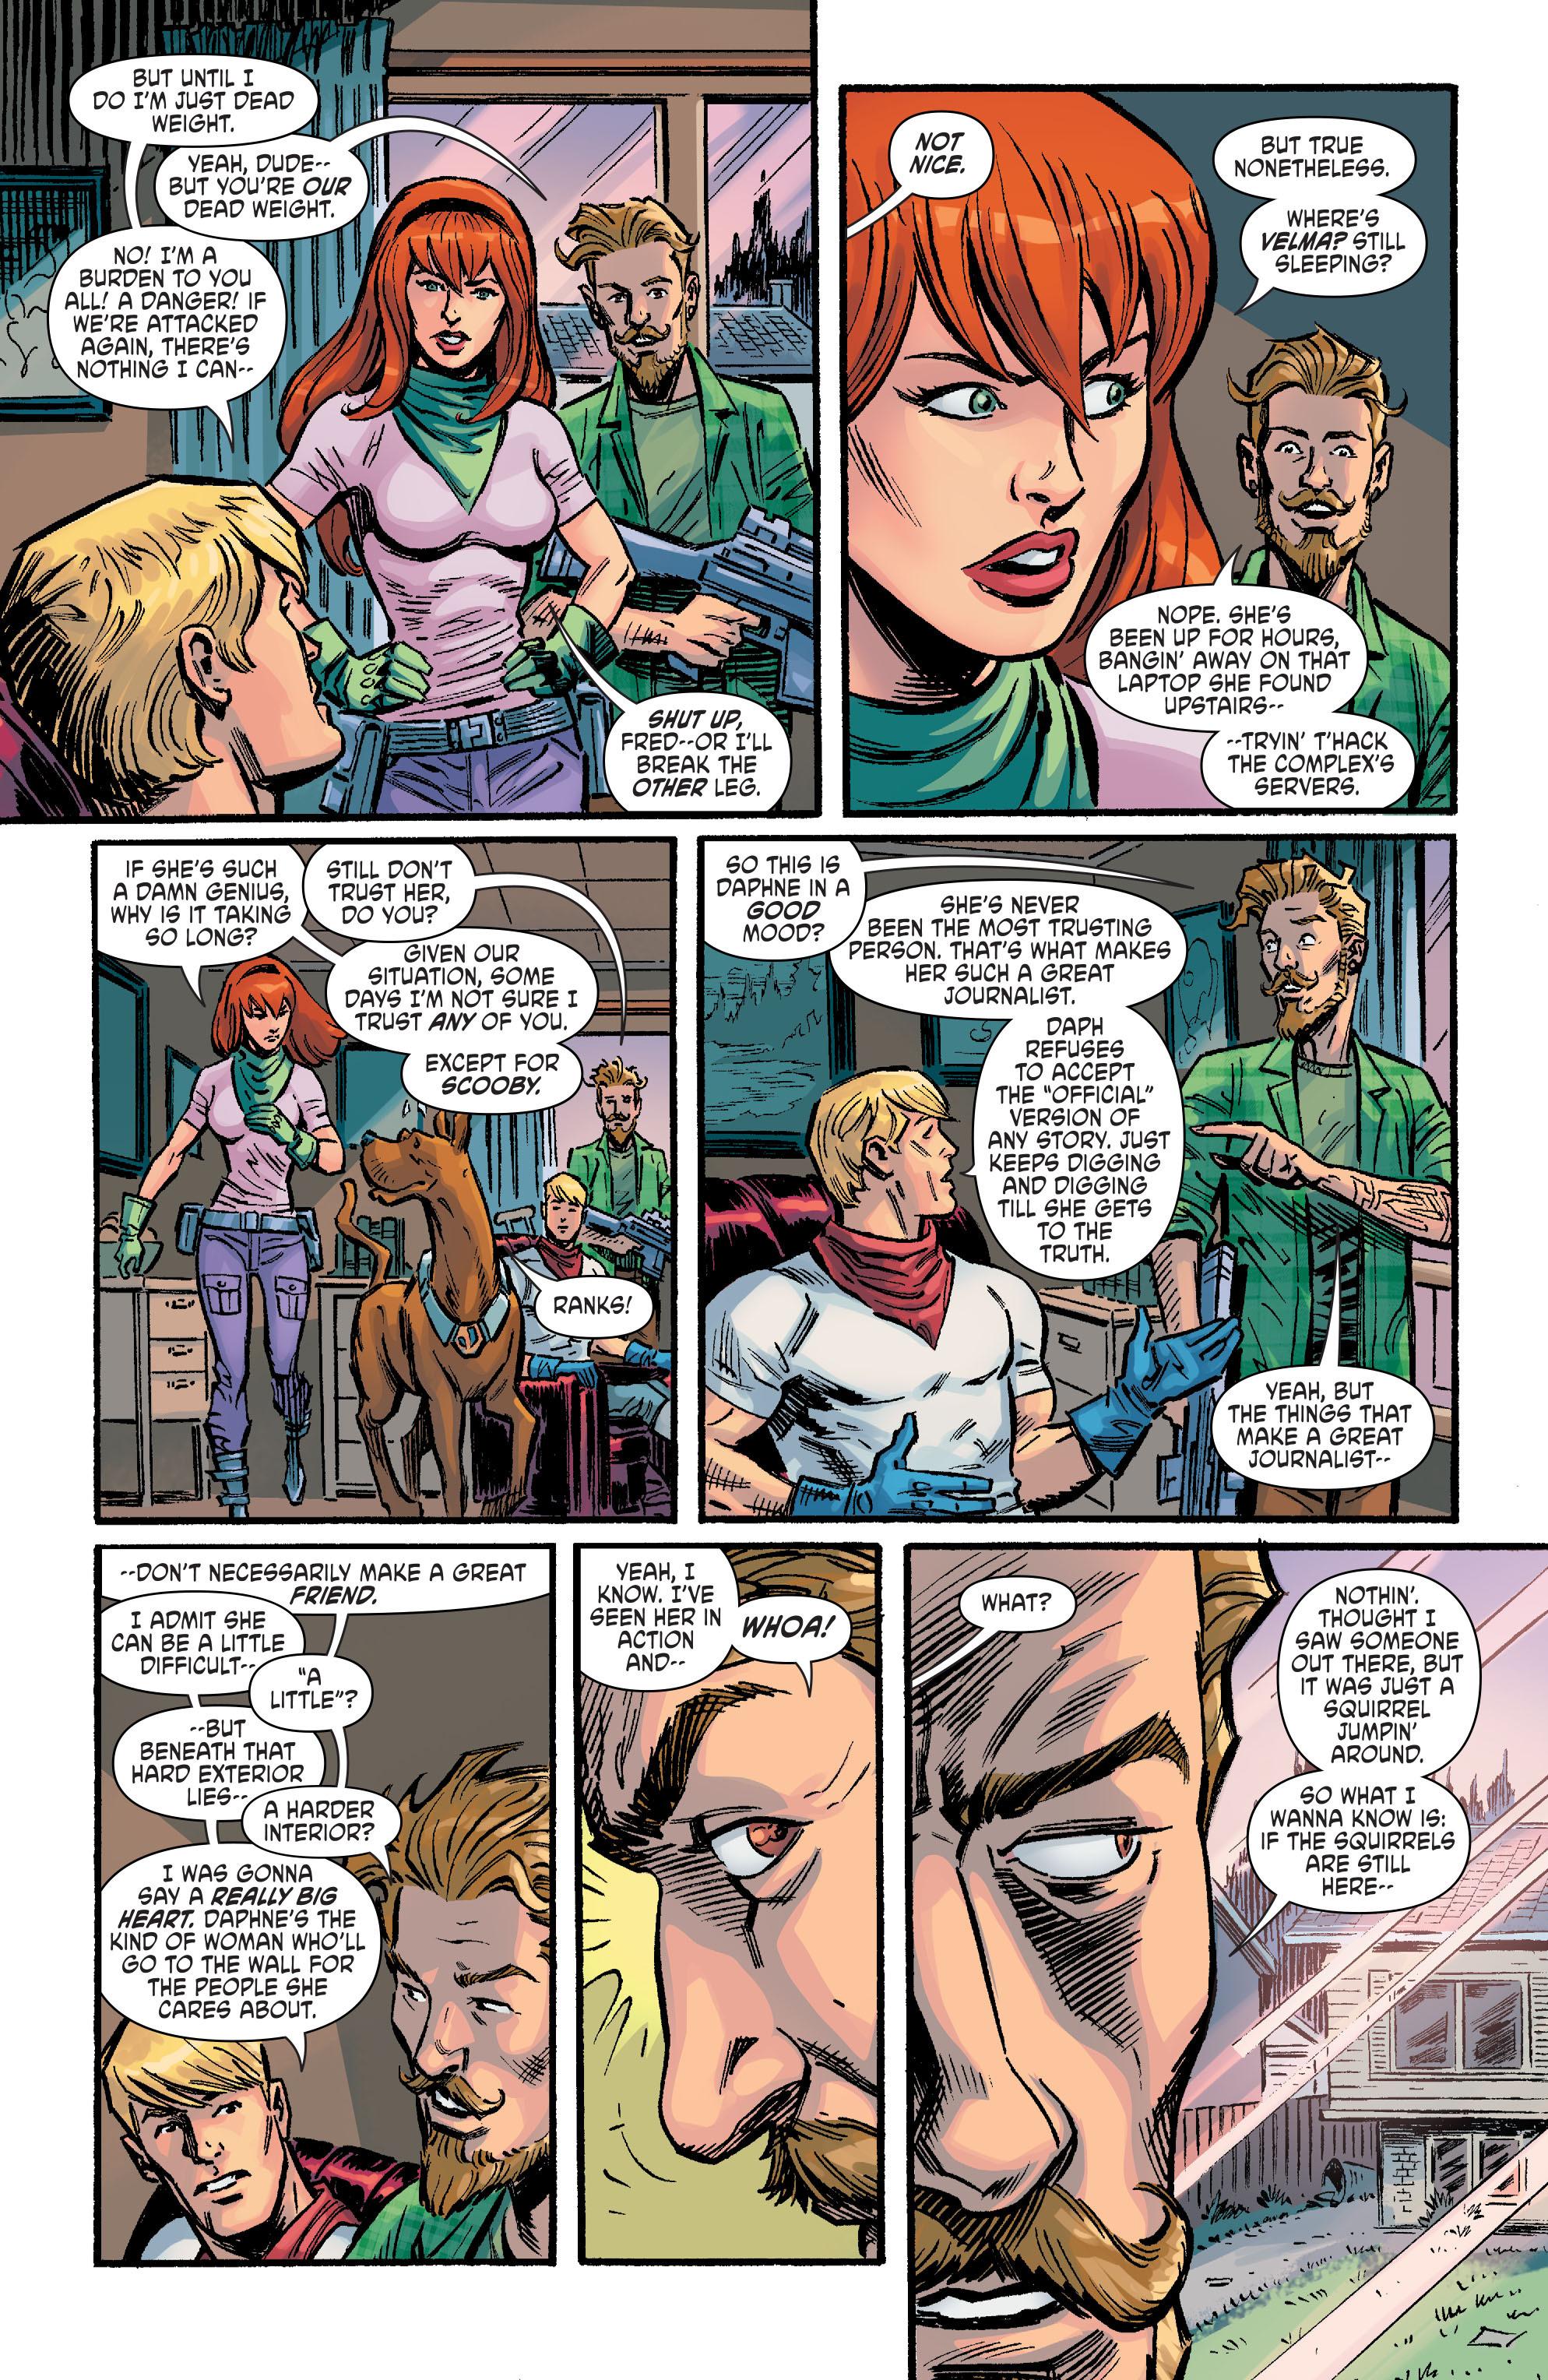 Read online Scooby Apocalypse comic -  Issue #9 - 6